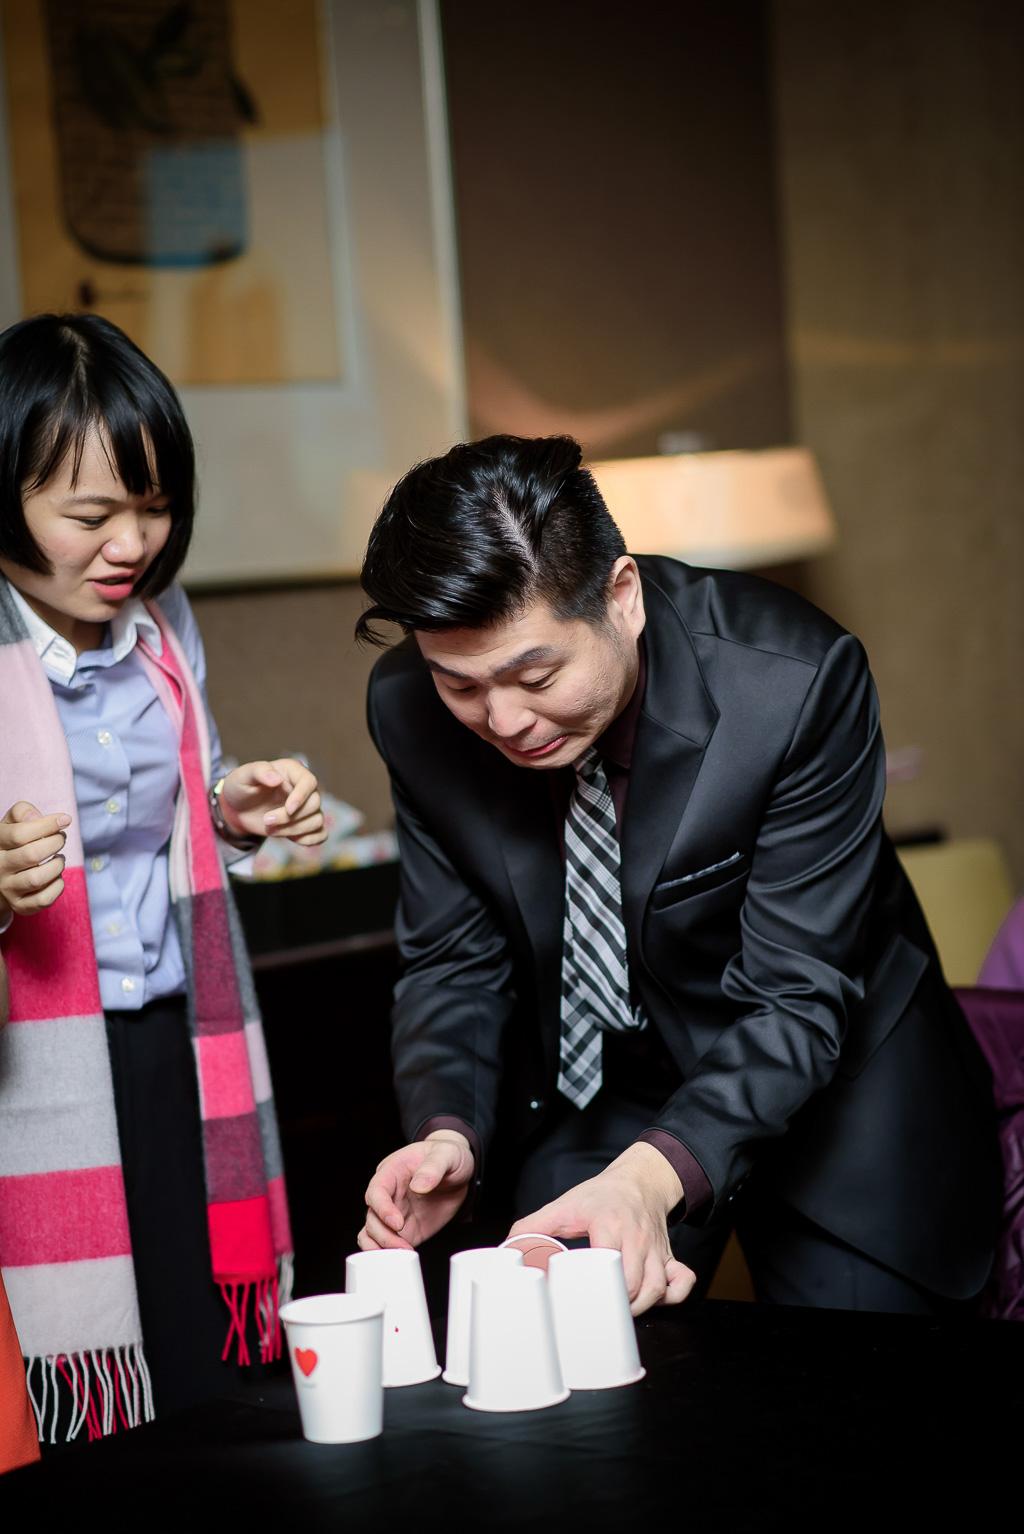 wedding day,婚攝小勇,台北婚攝,晶華,台北國賓,台北國賓婚宴 ,愛瑞思,Miko,新秘,-115